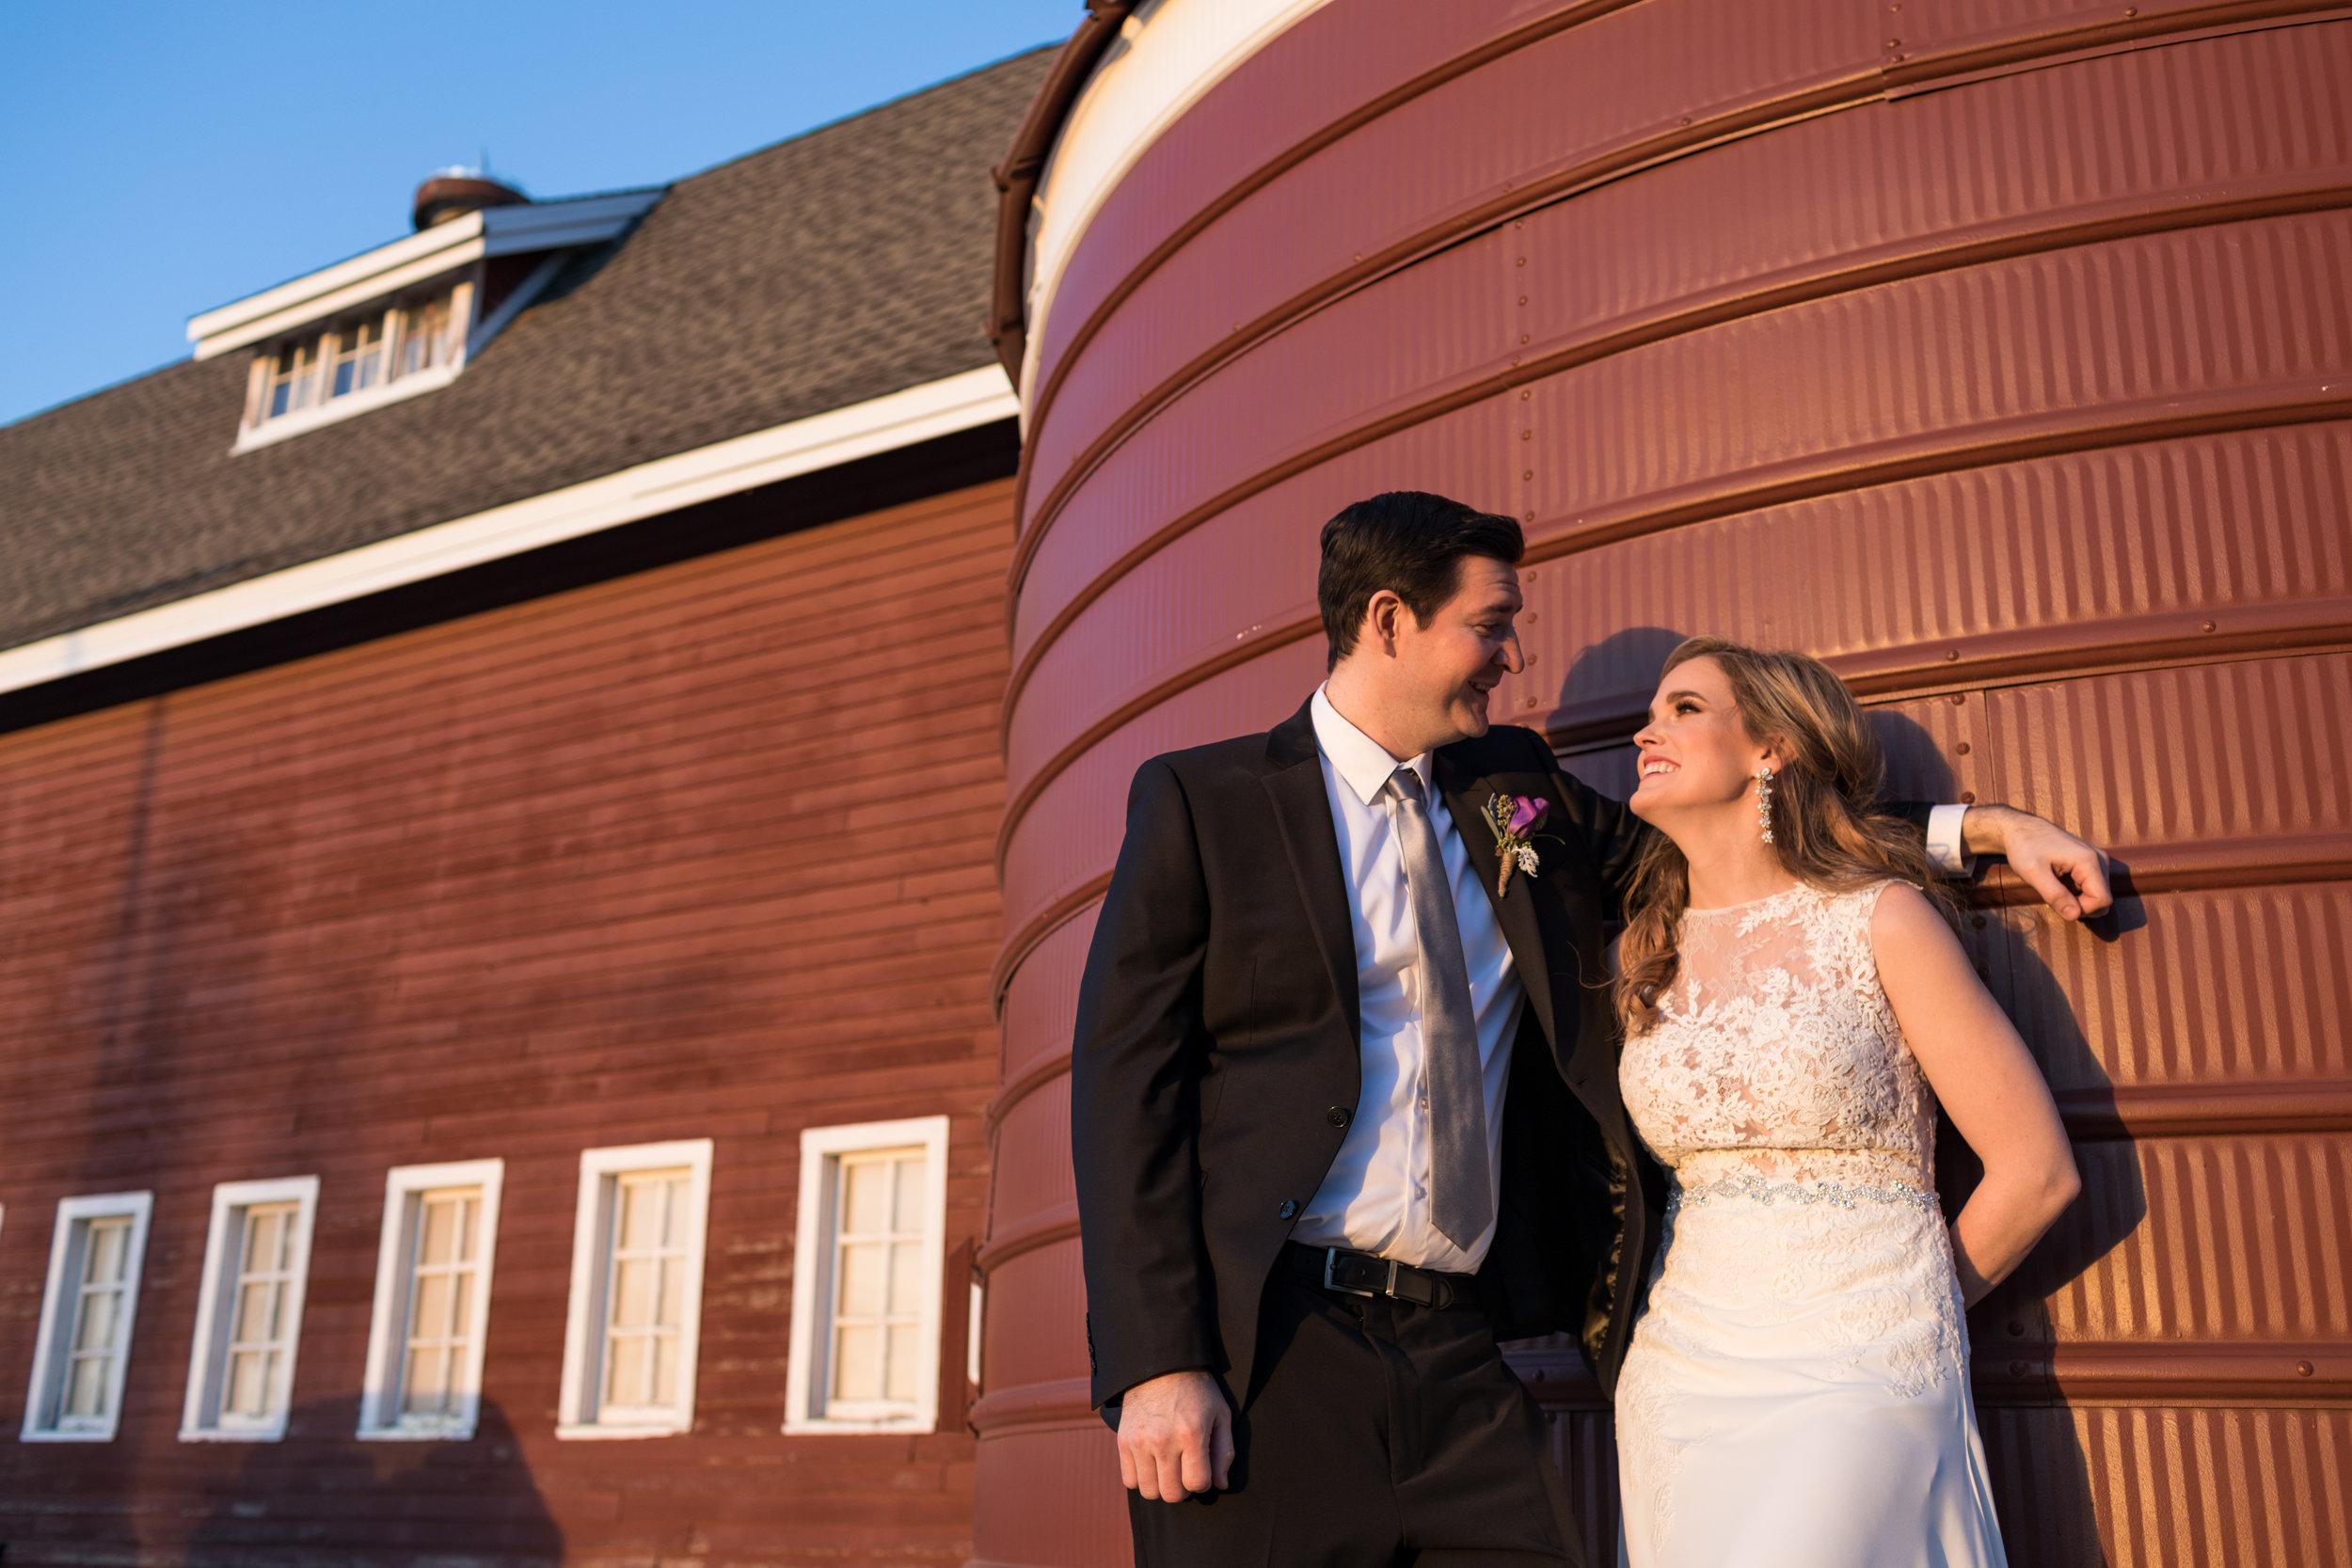 Katie + Phil - at the ackerhurst dairy barn